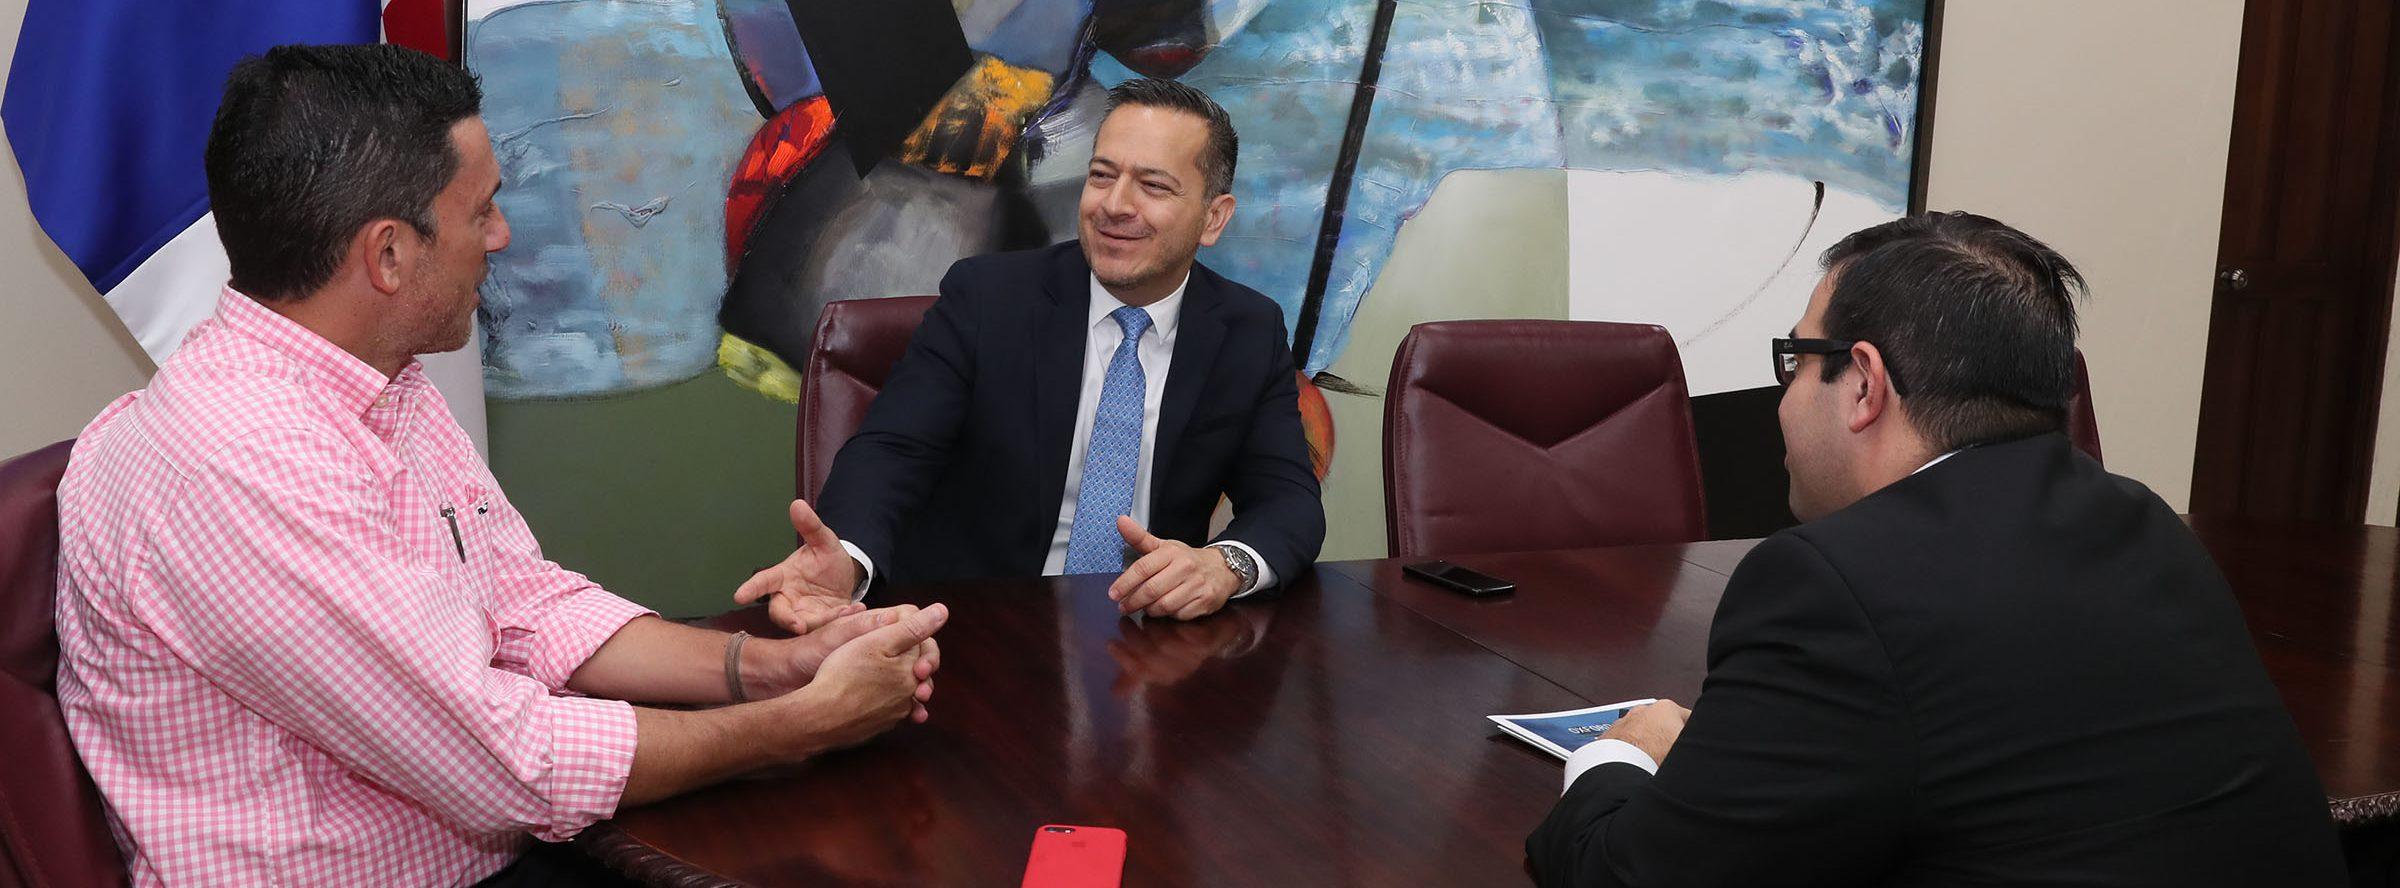 Panamá e IATA comparten posiciones sobre la industria del transporte aéreo